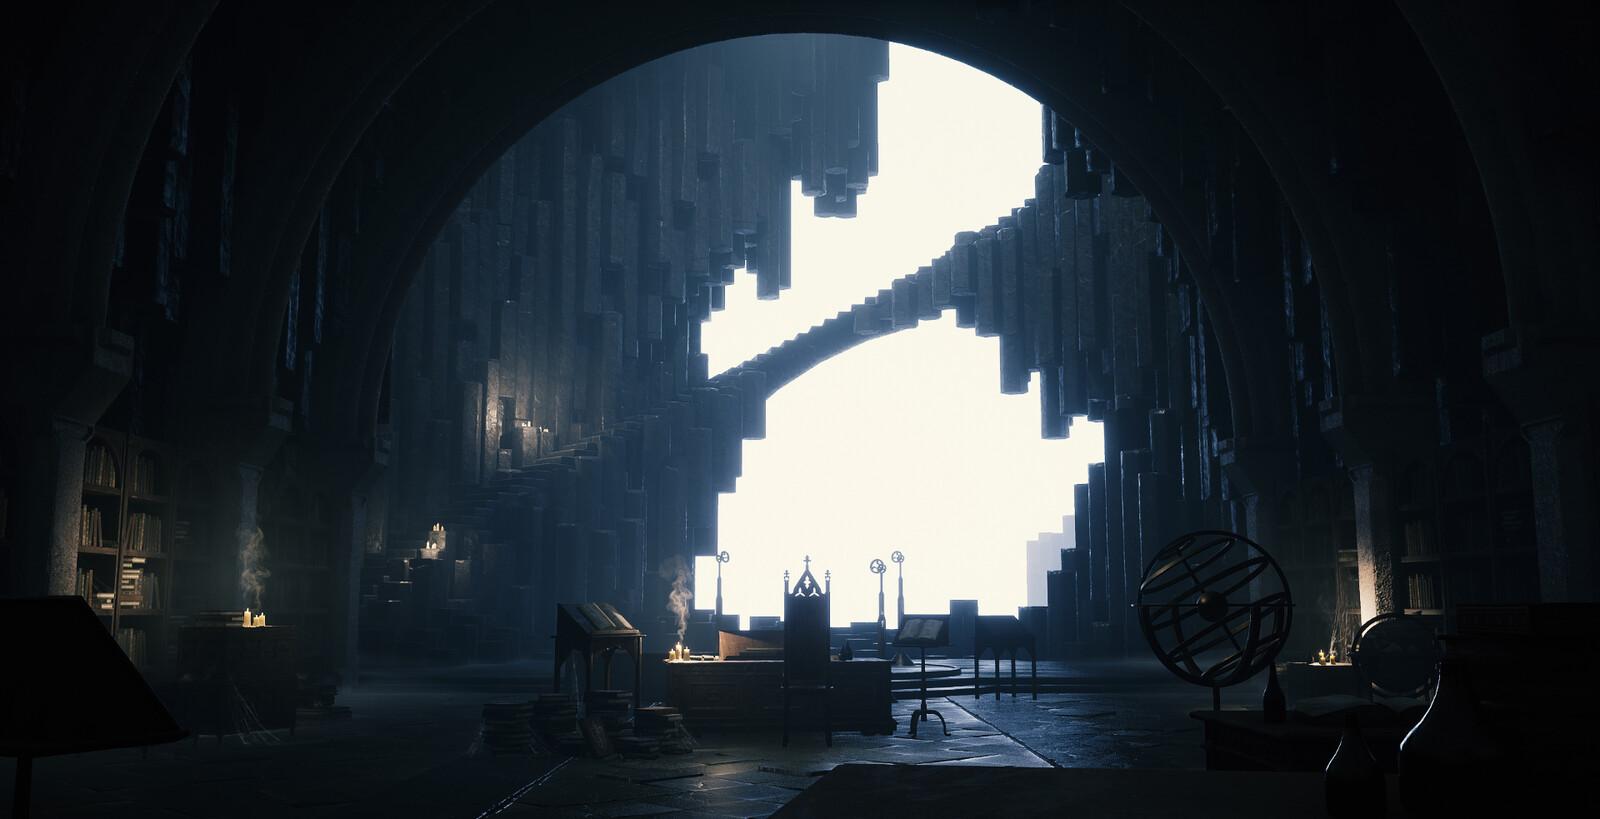 Artstation Challenge: The Legend of King Arthur, Game Environment/Level Art Submission